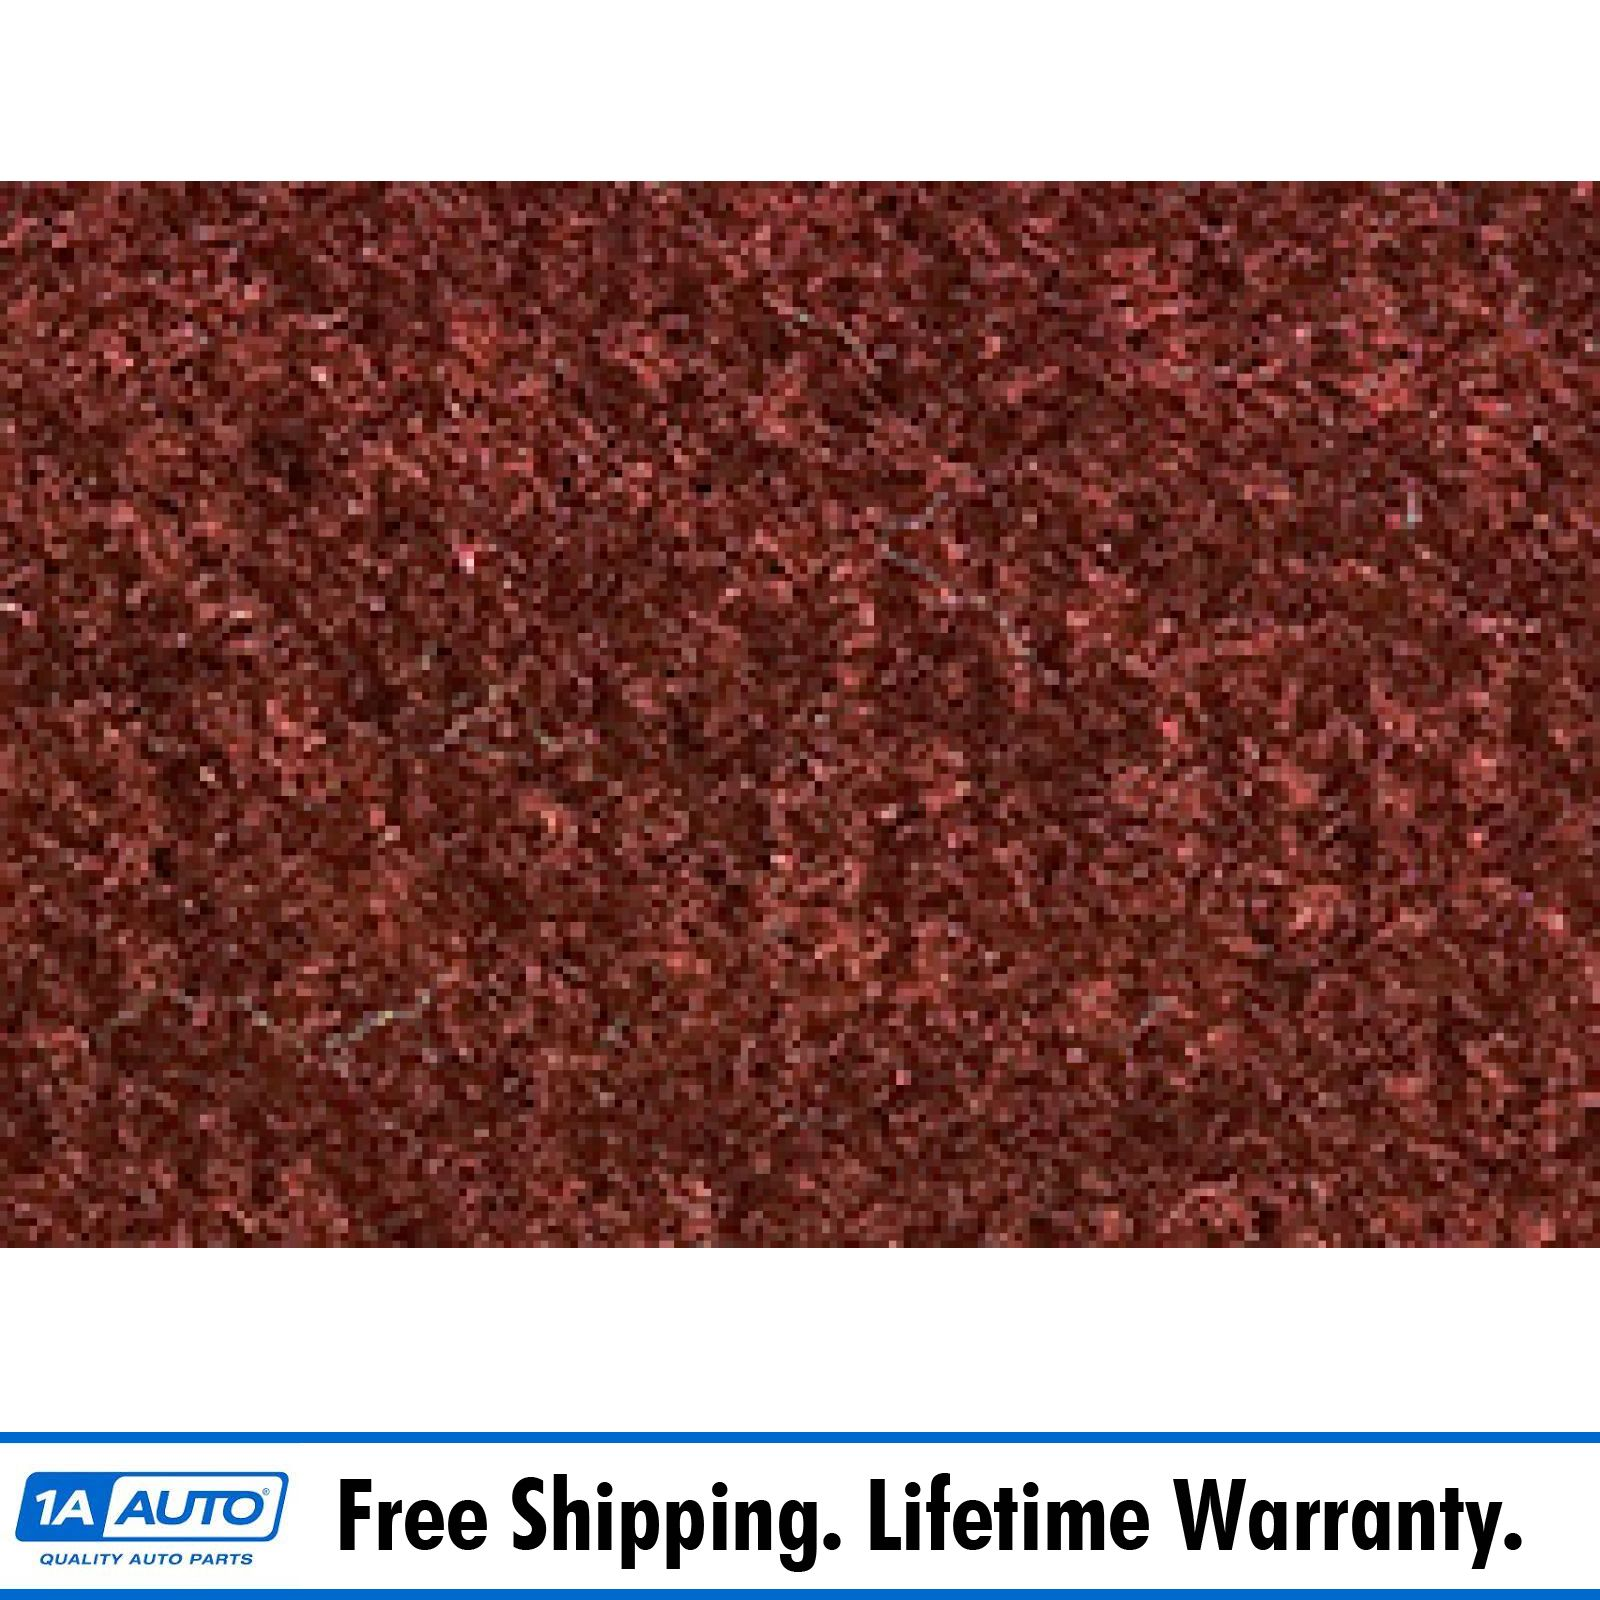 for 1987-95 Nissan Pathfinder Cutpile 9205-Cognac Passenger Area Carpet Molded